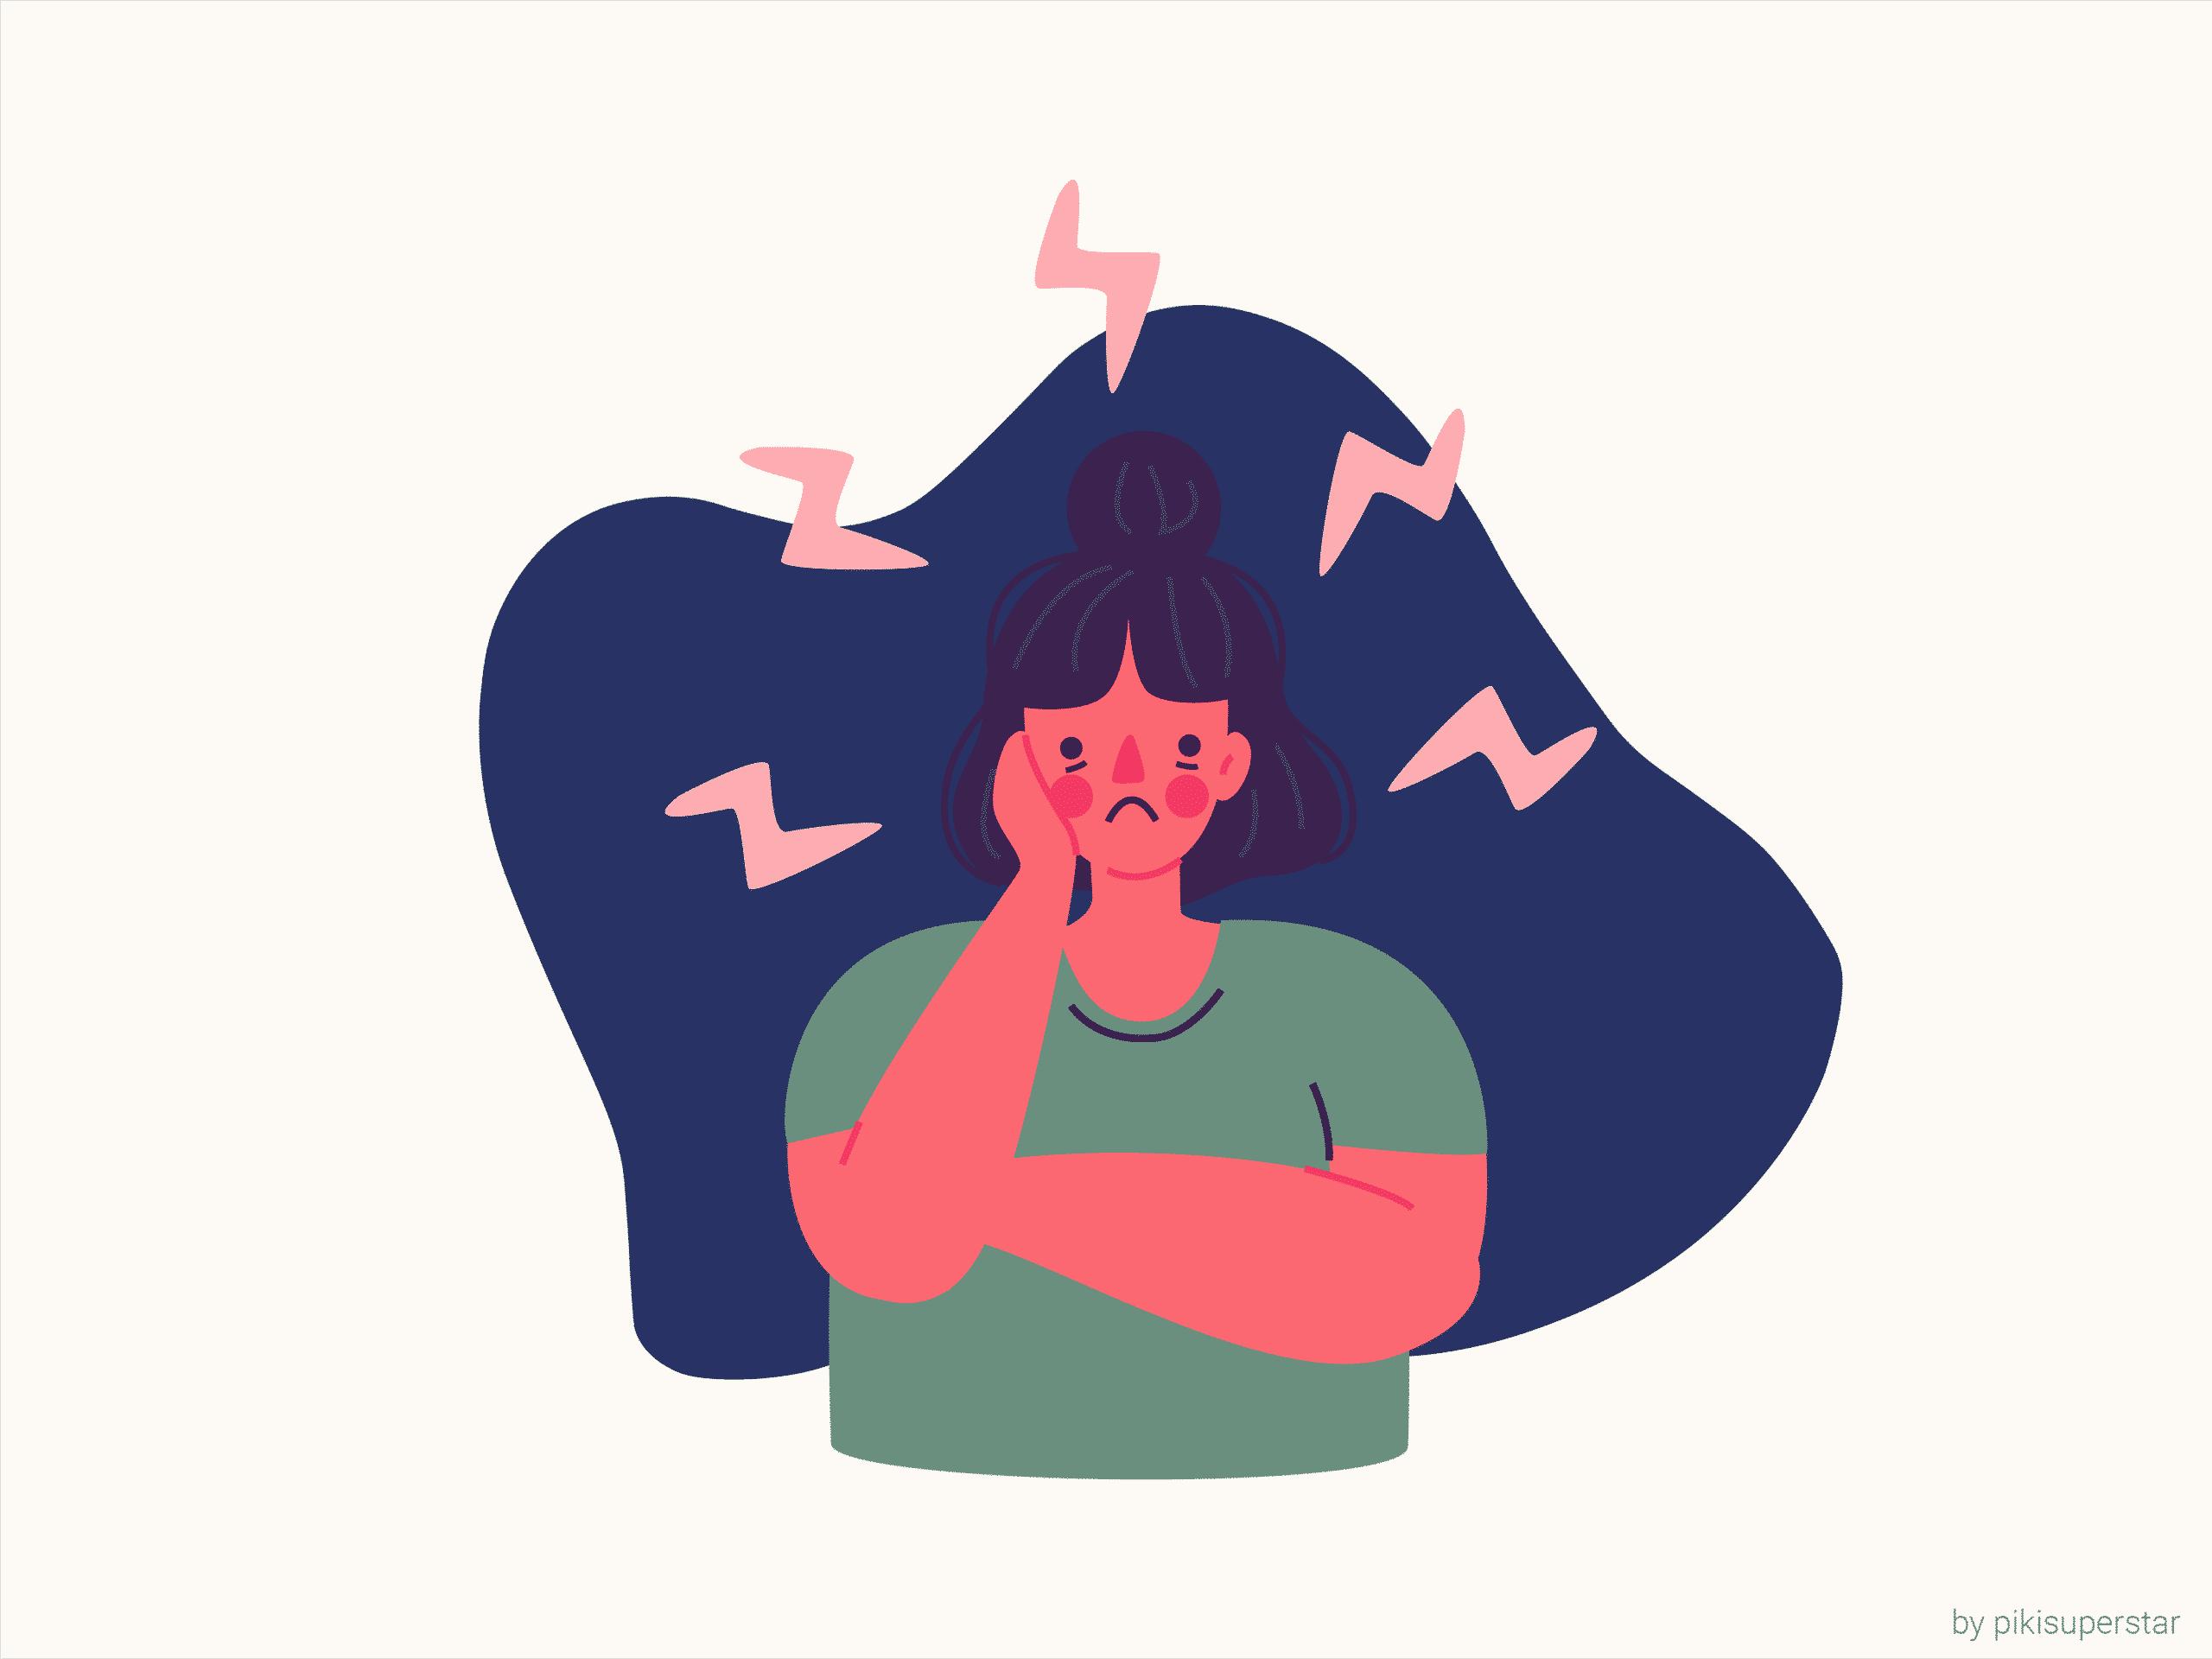 Viser person med stress